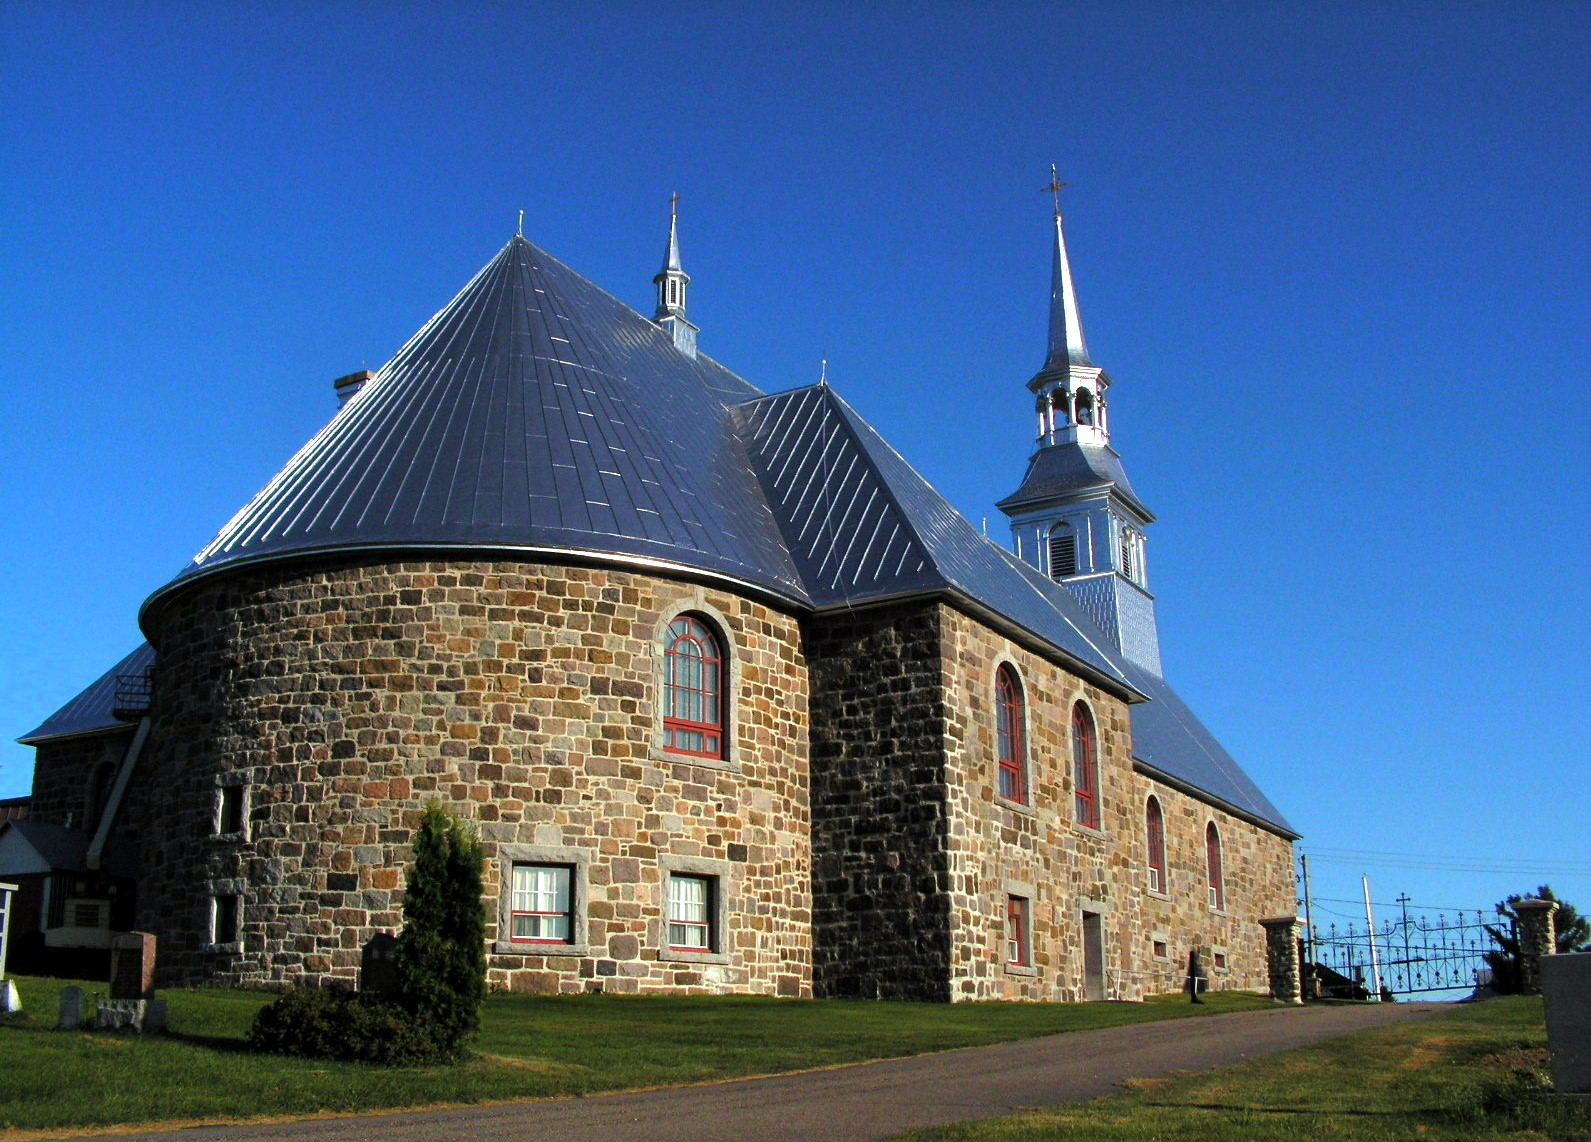 Church Of The Village by JocelyneR